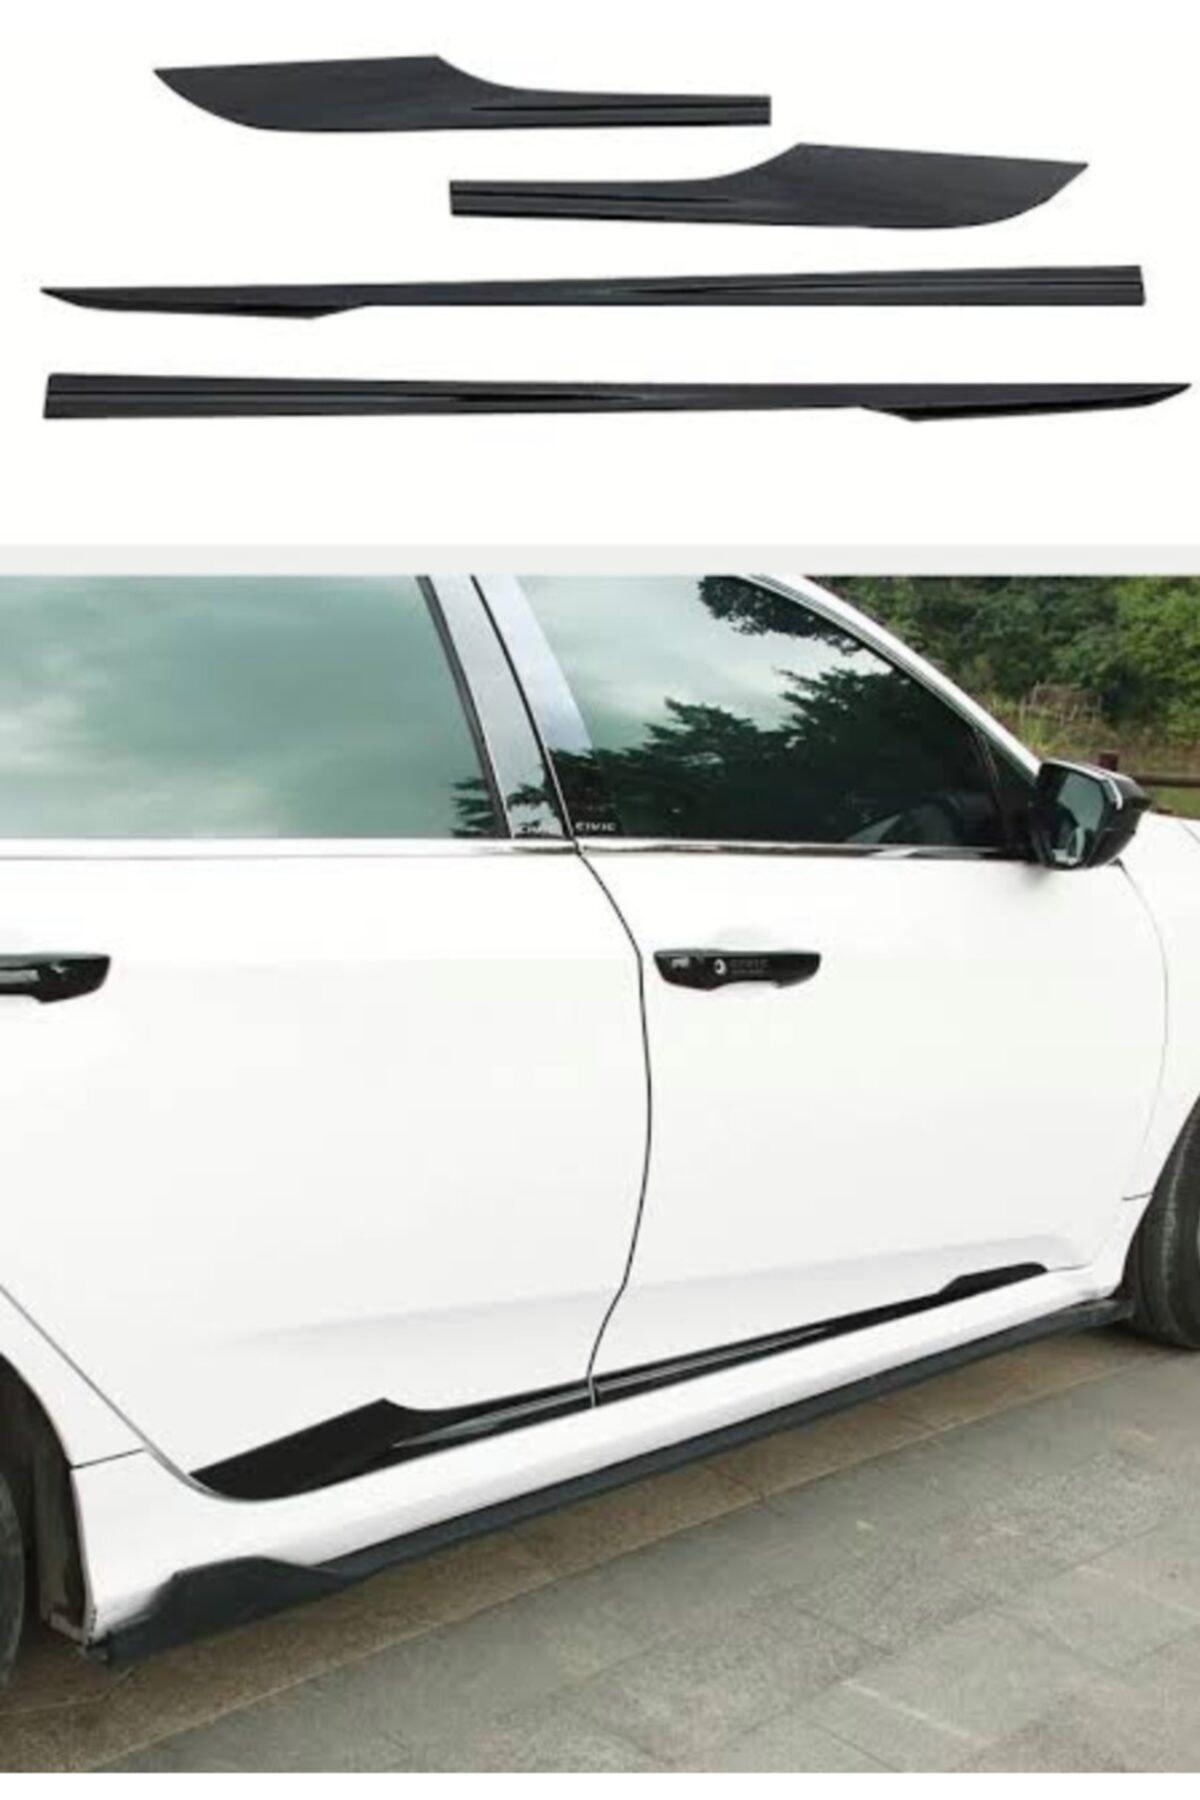 Universal Honda Civic Kapı Çıtası (16-20) Pianoblack 1